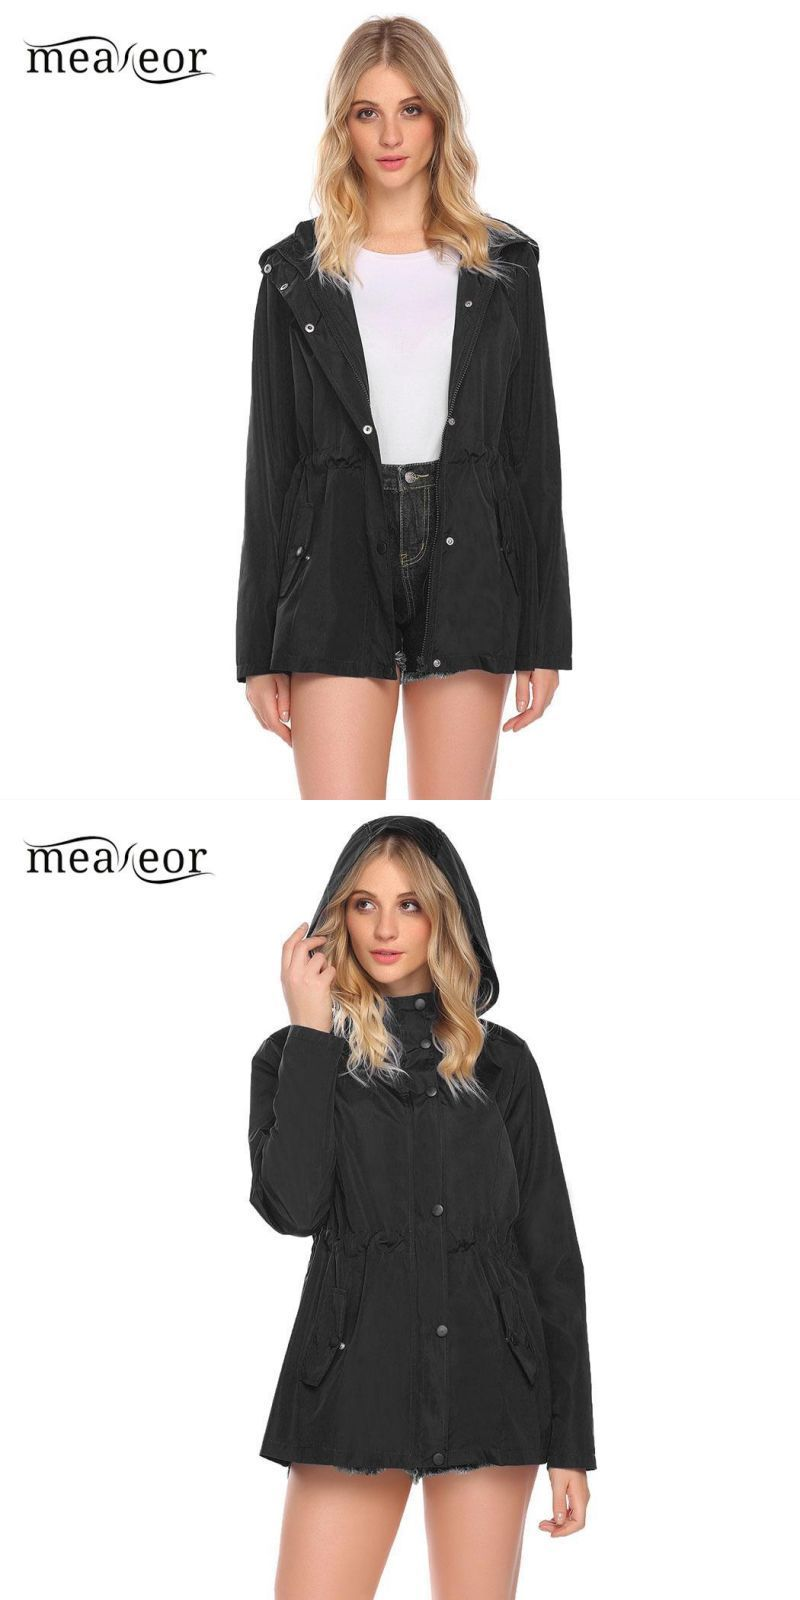 c1a21b15 Fashion hooded casual women coat ladies spring jacket long sleeve ...